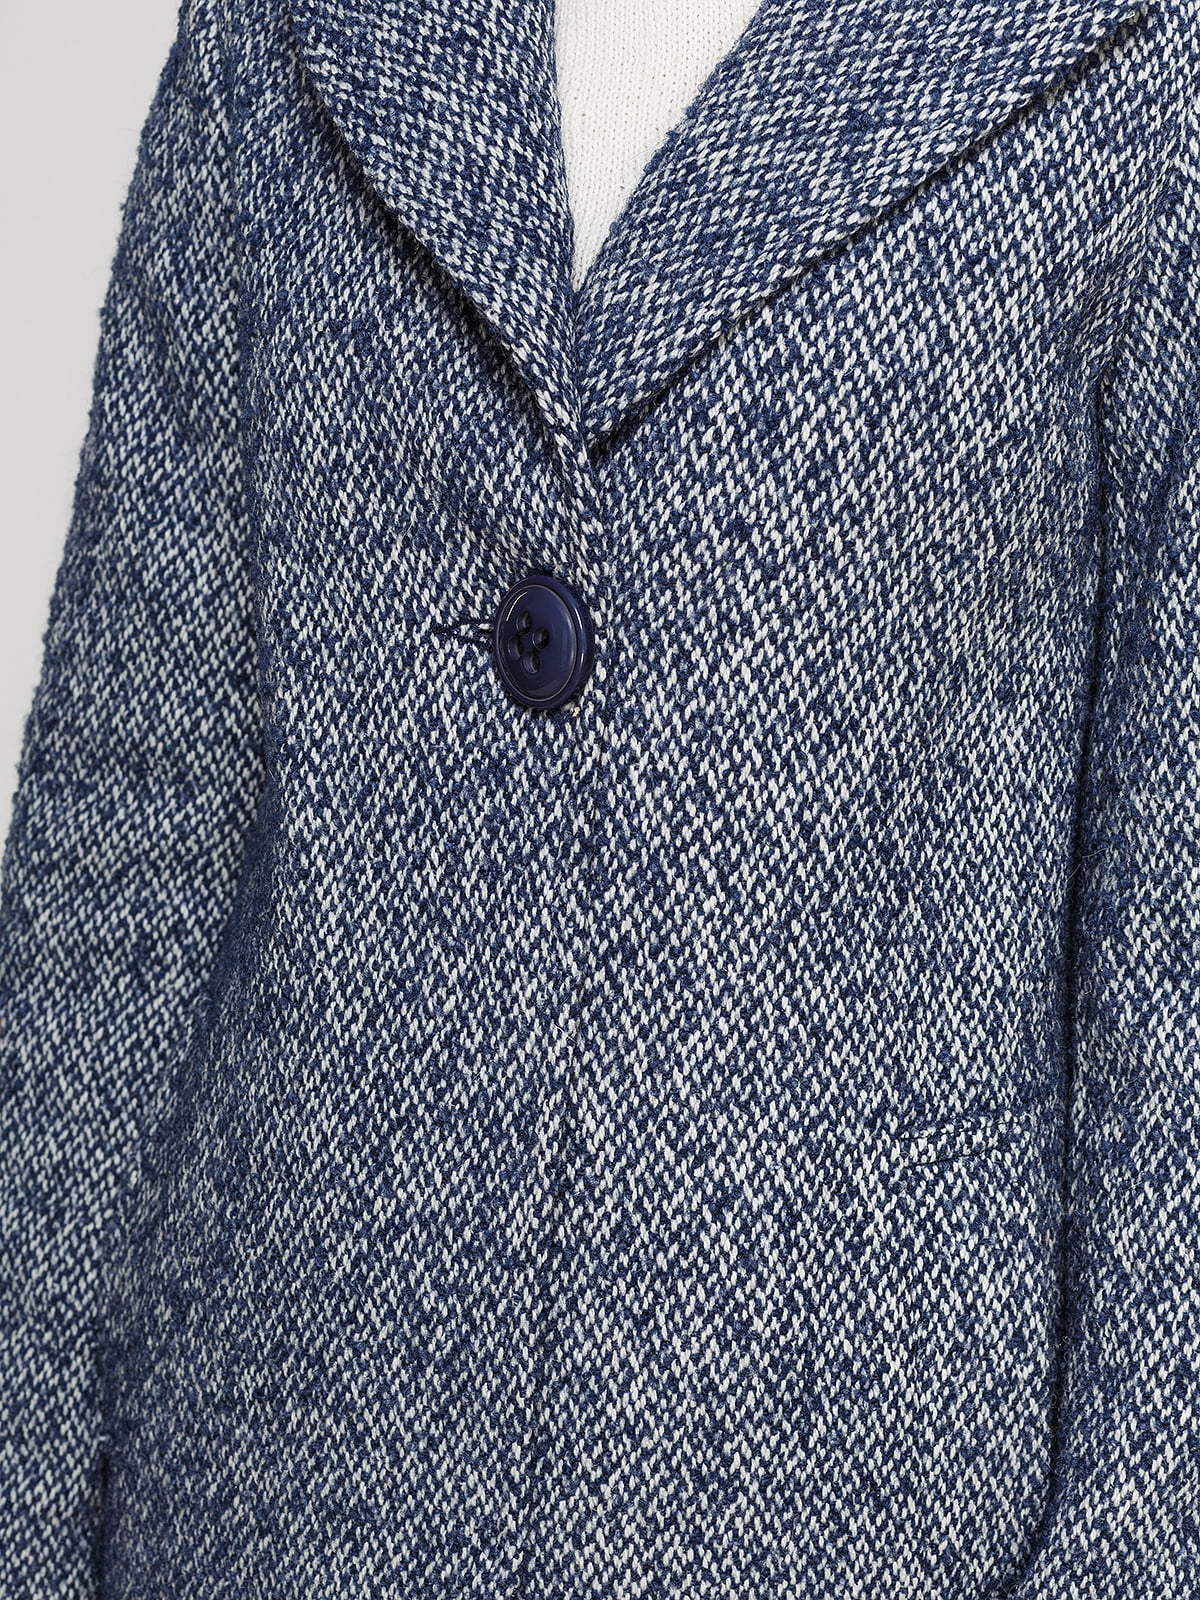 Пальто светло-синее | 4492631 | фото 4